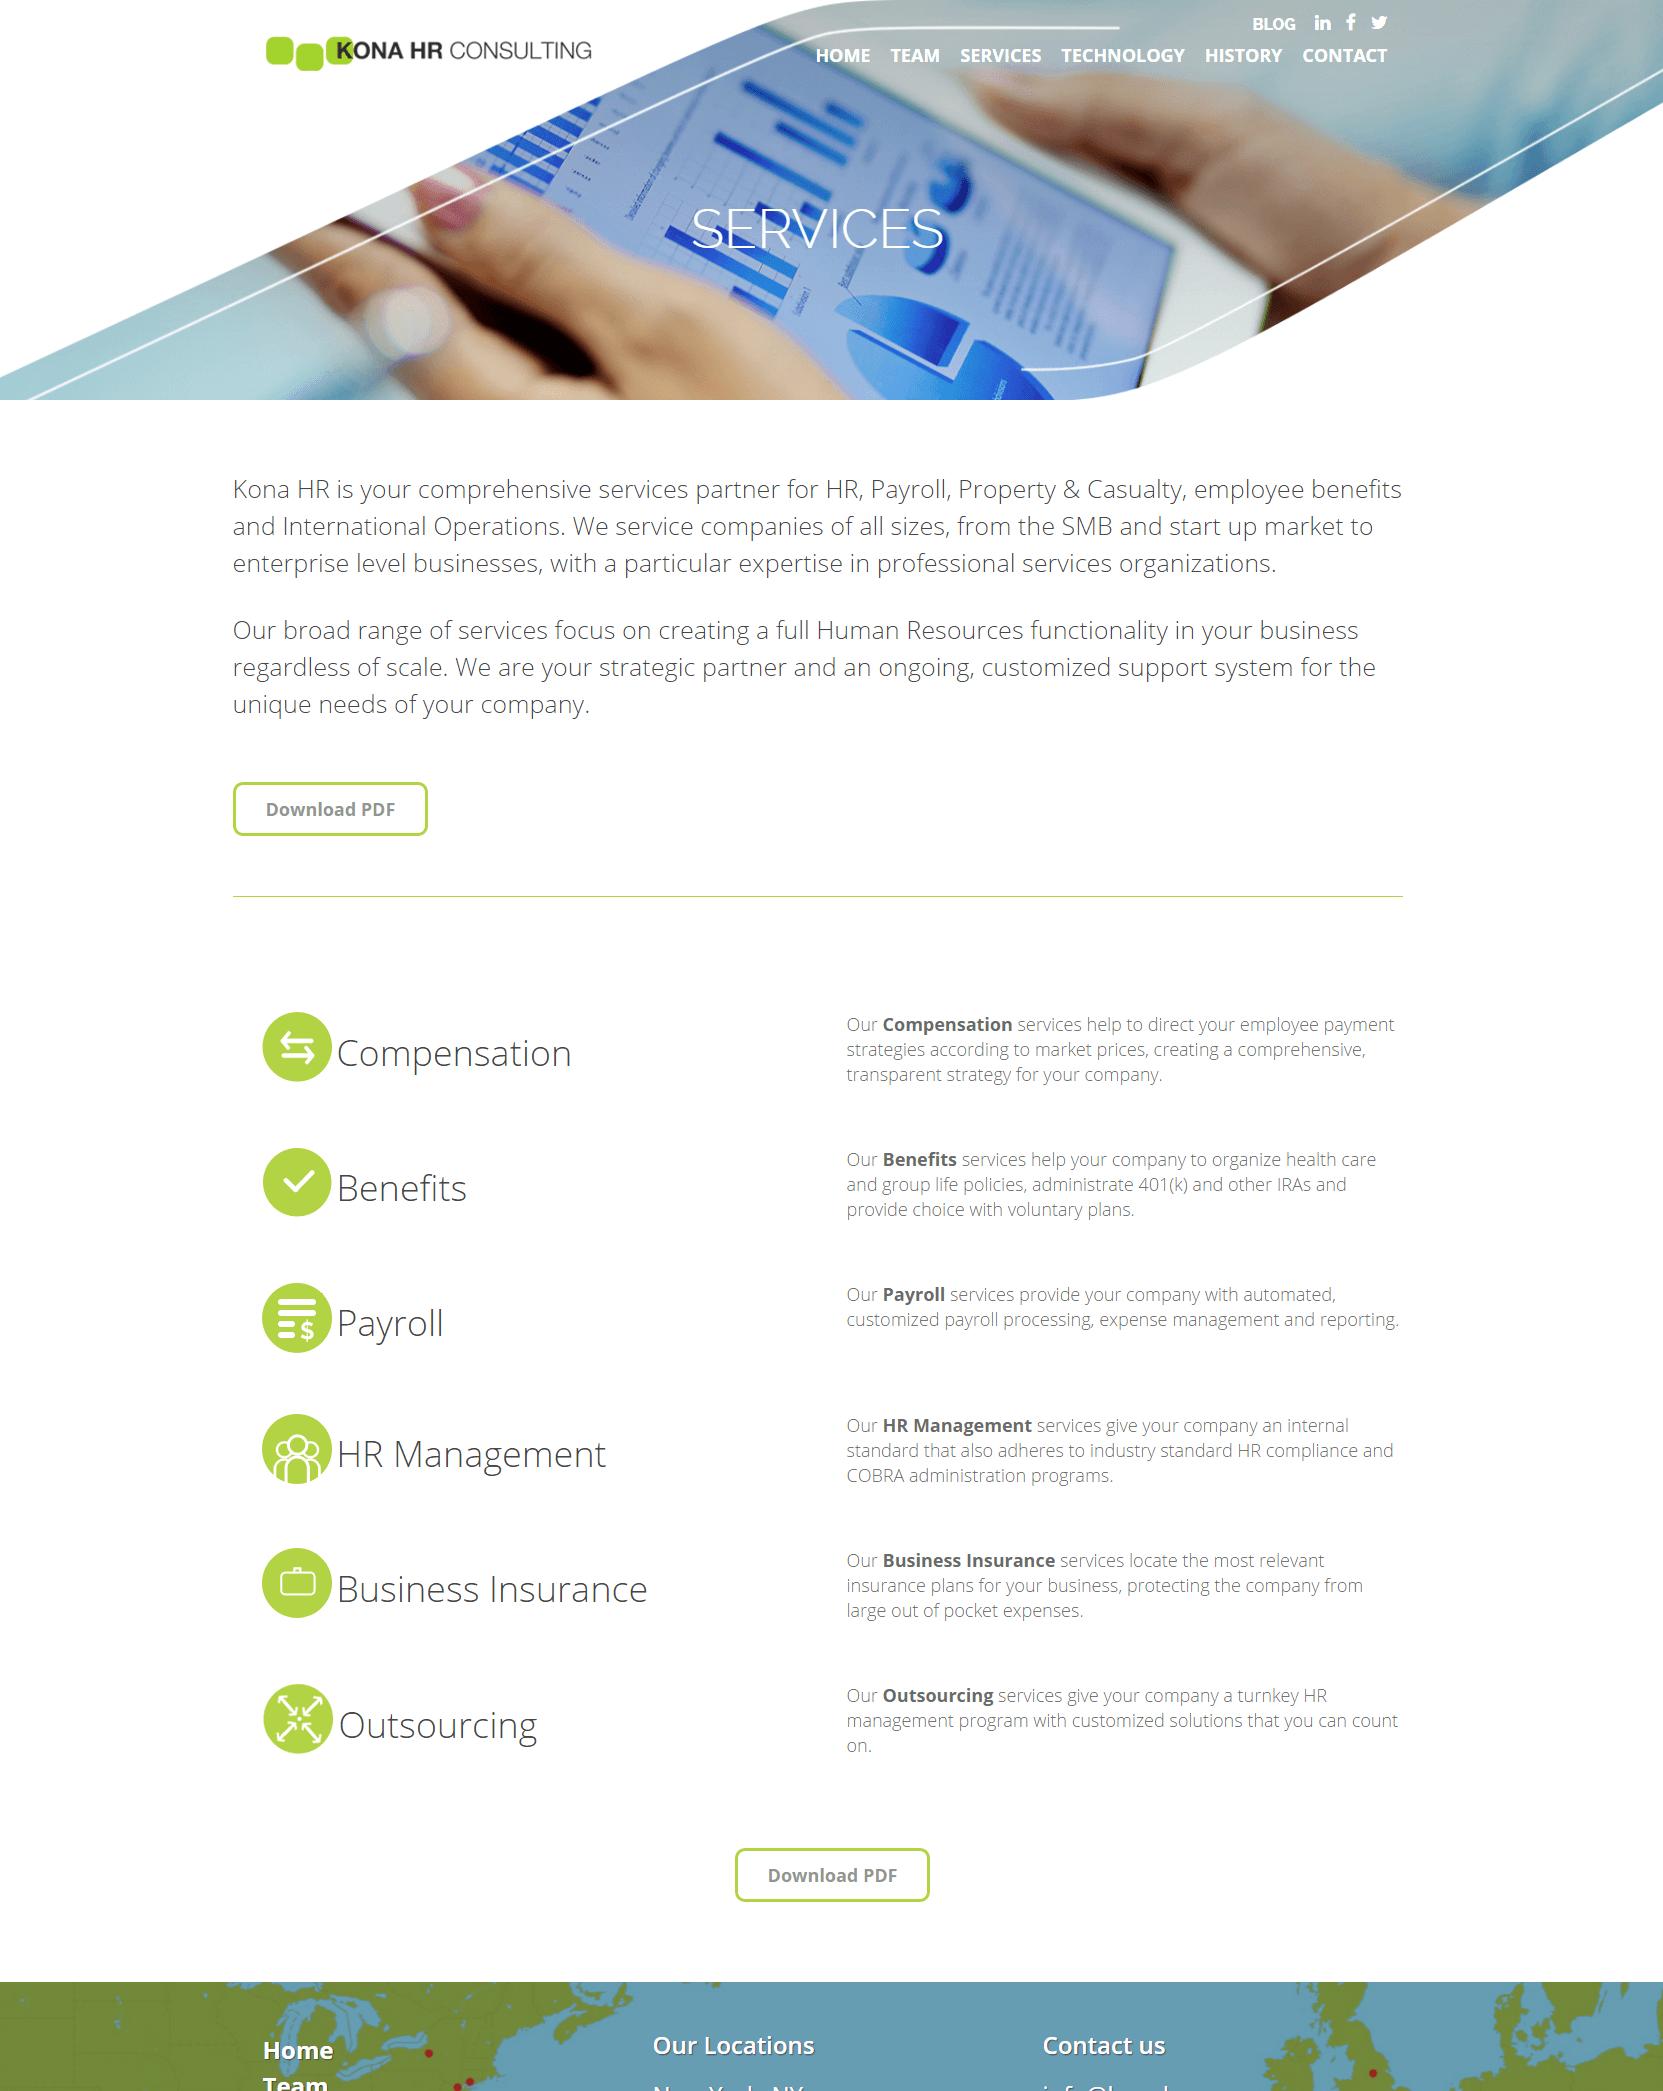 konar-services